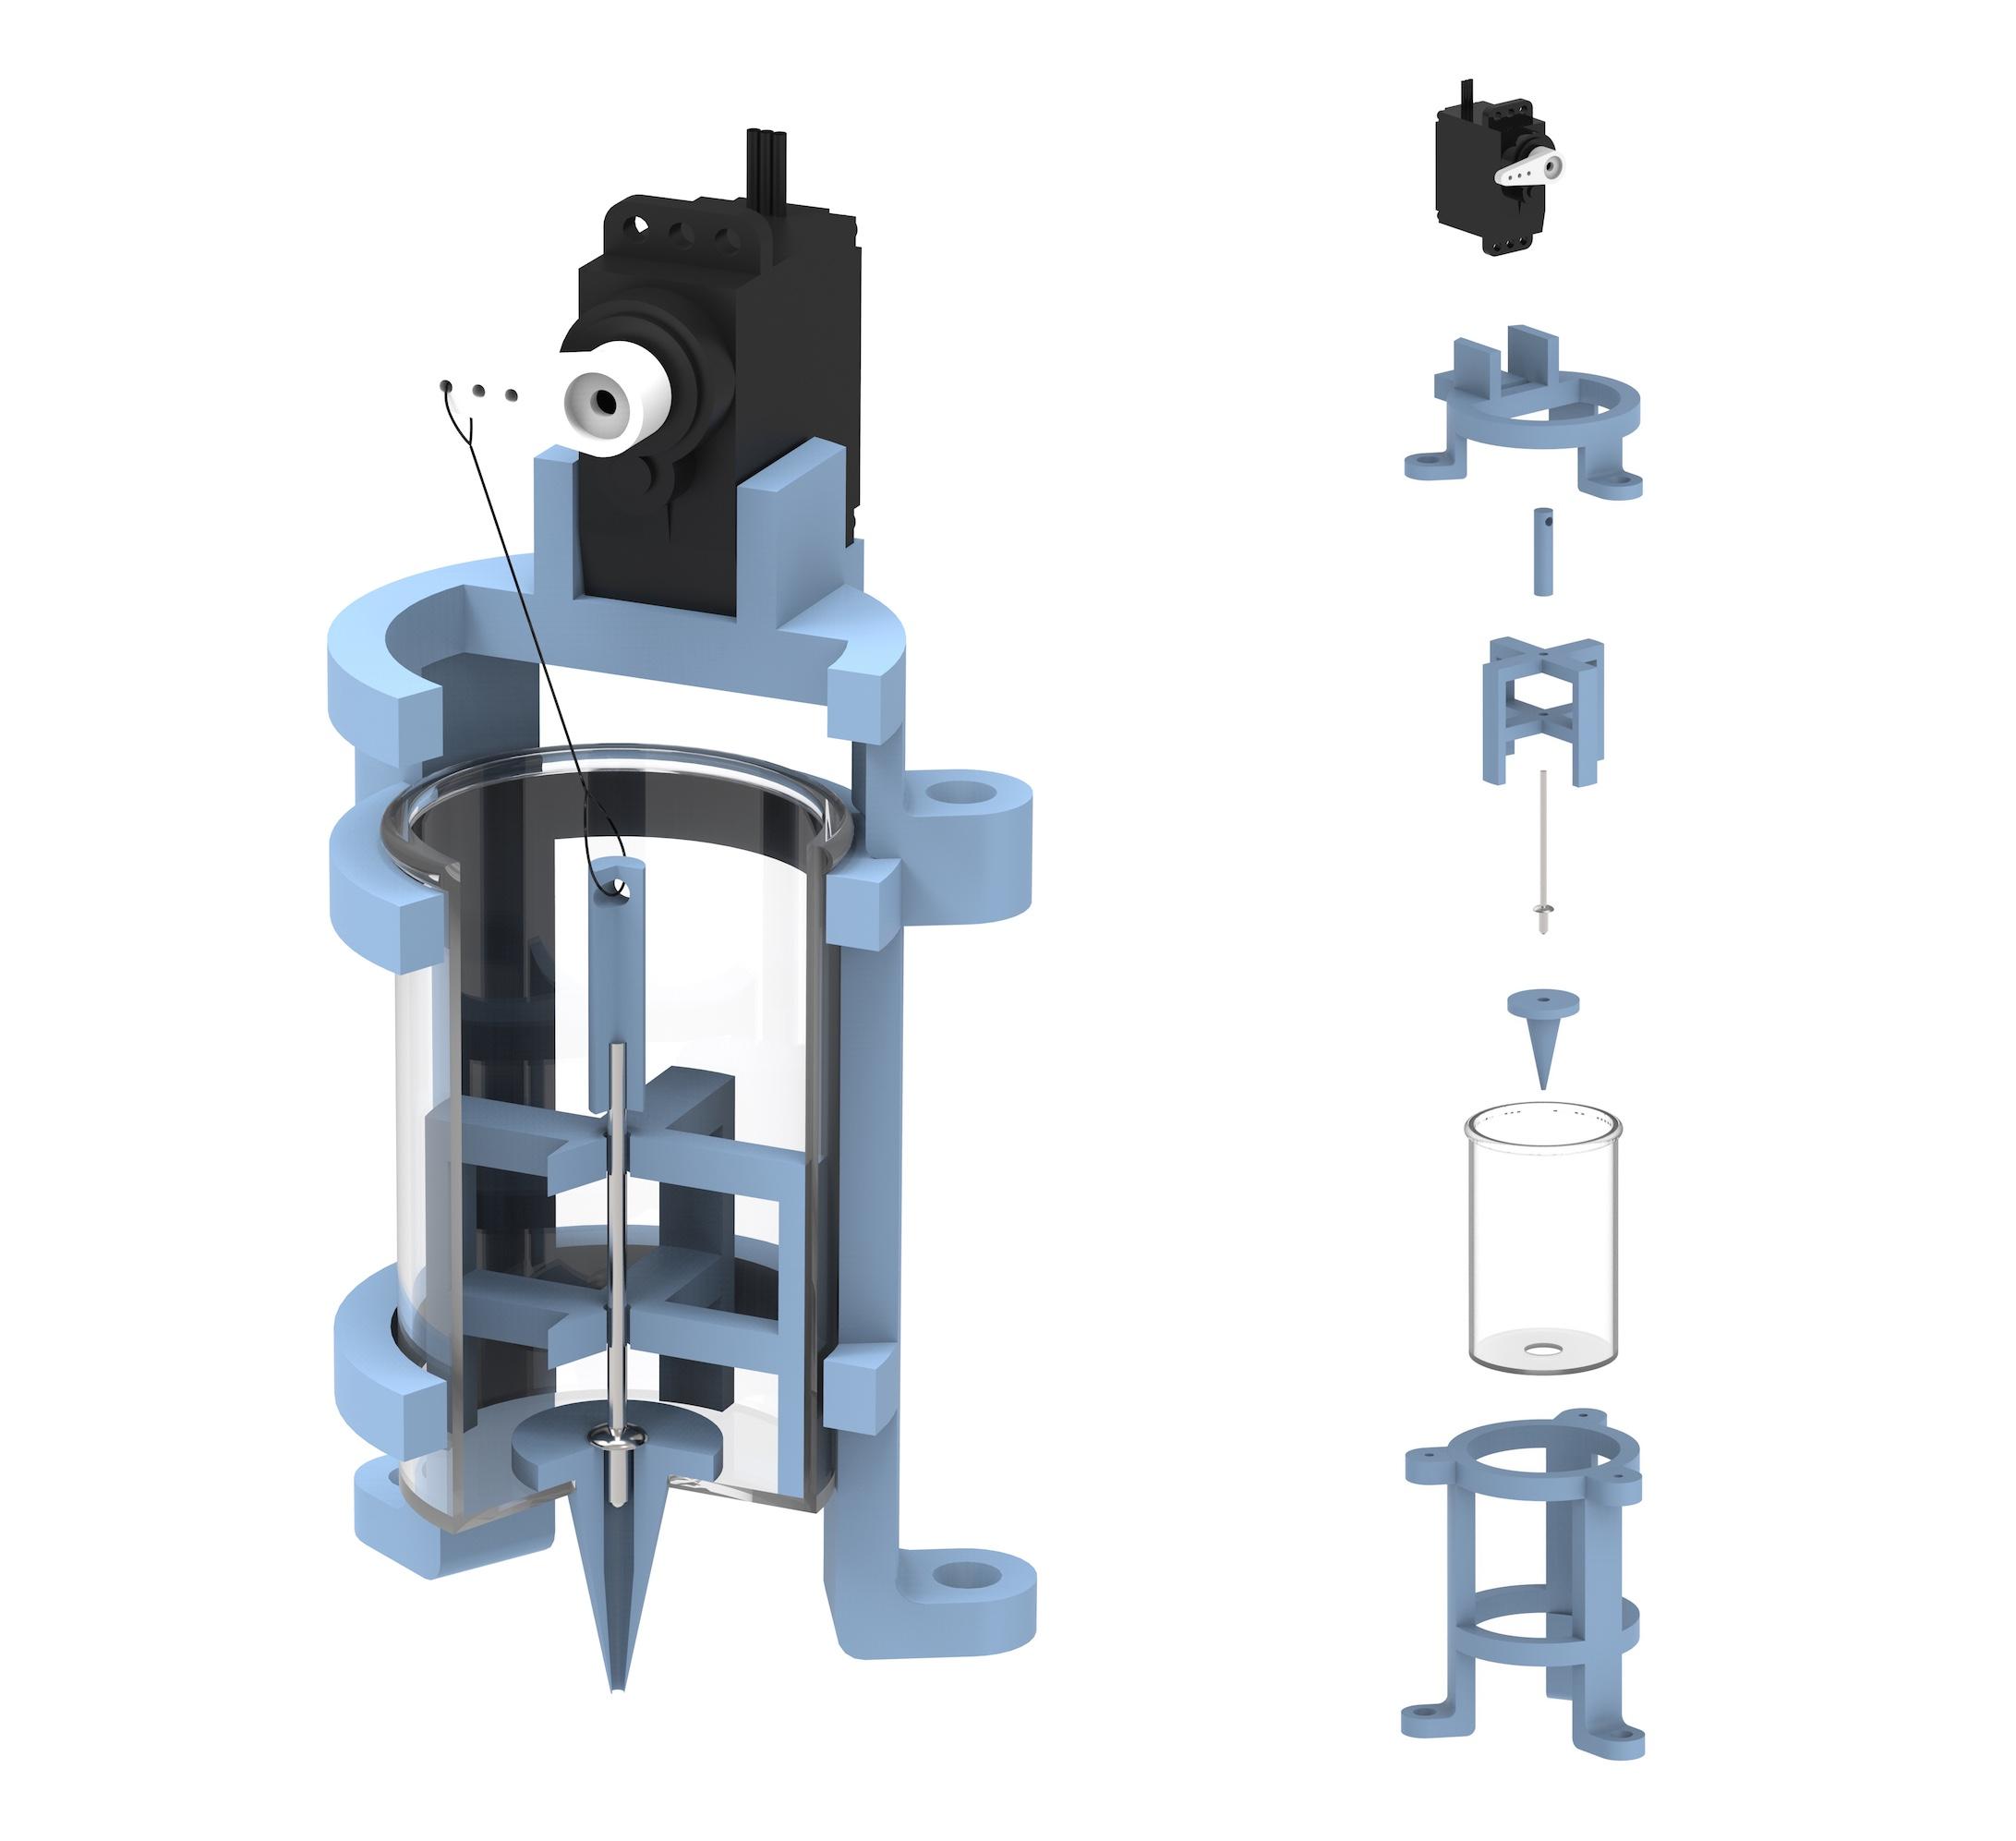 eclate_system_dripping_machine_pierre_felix_so